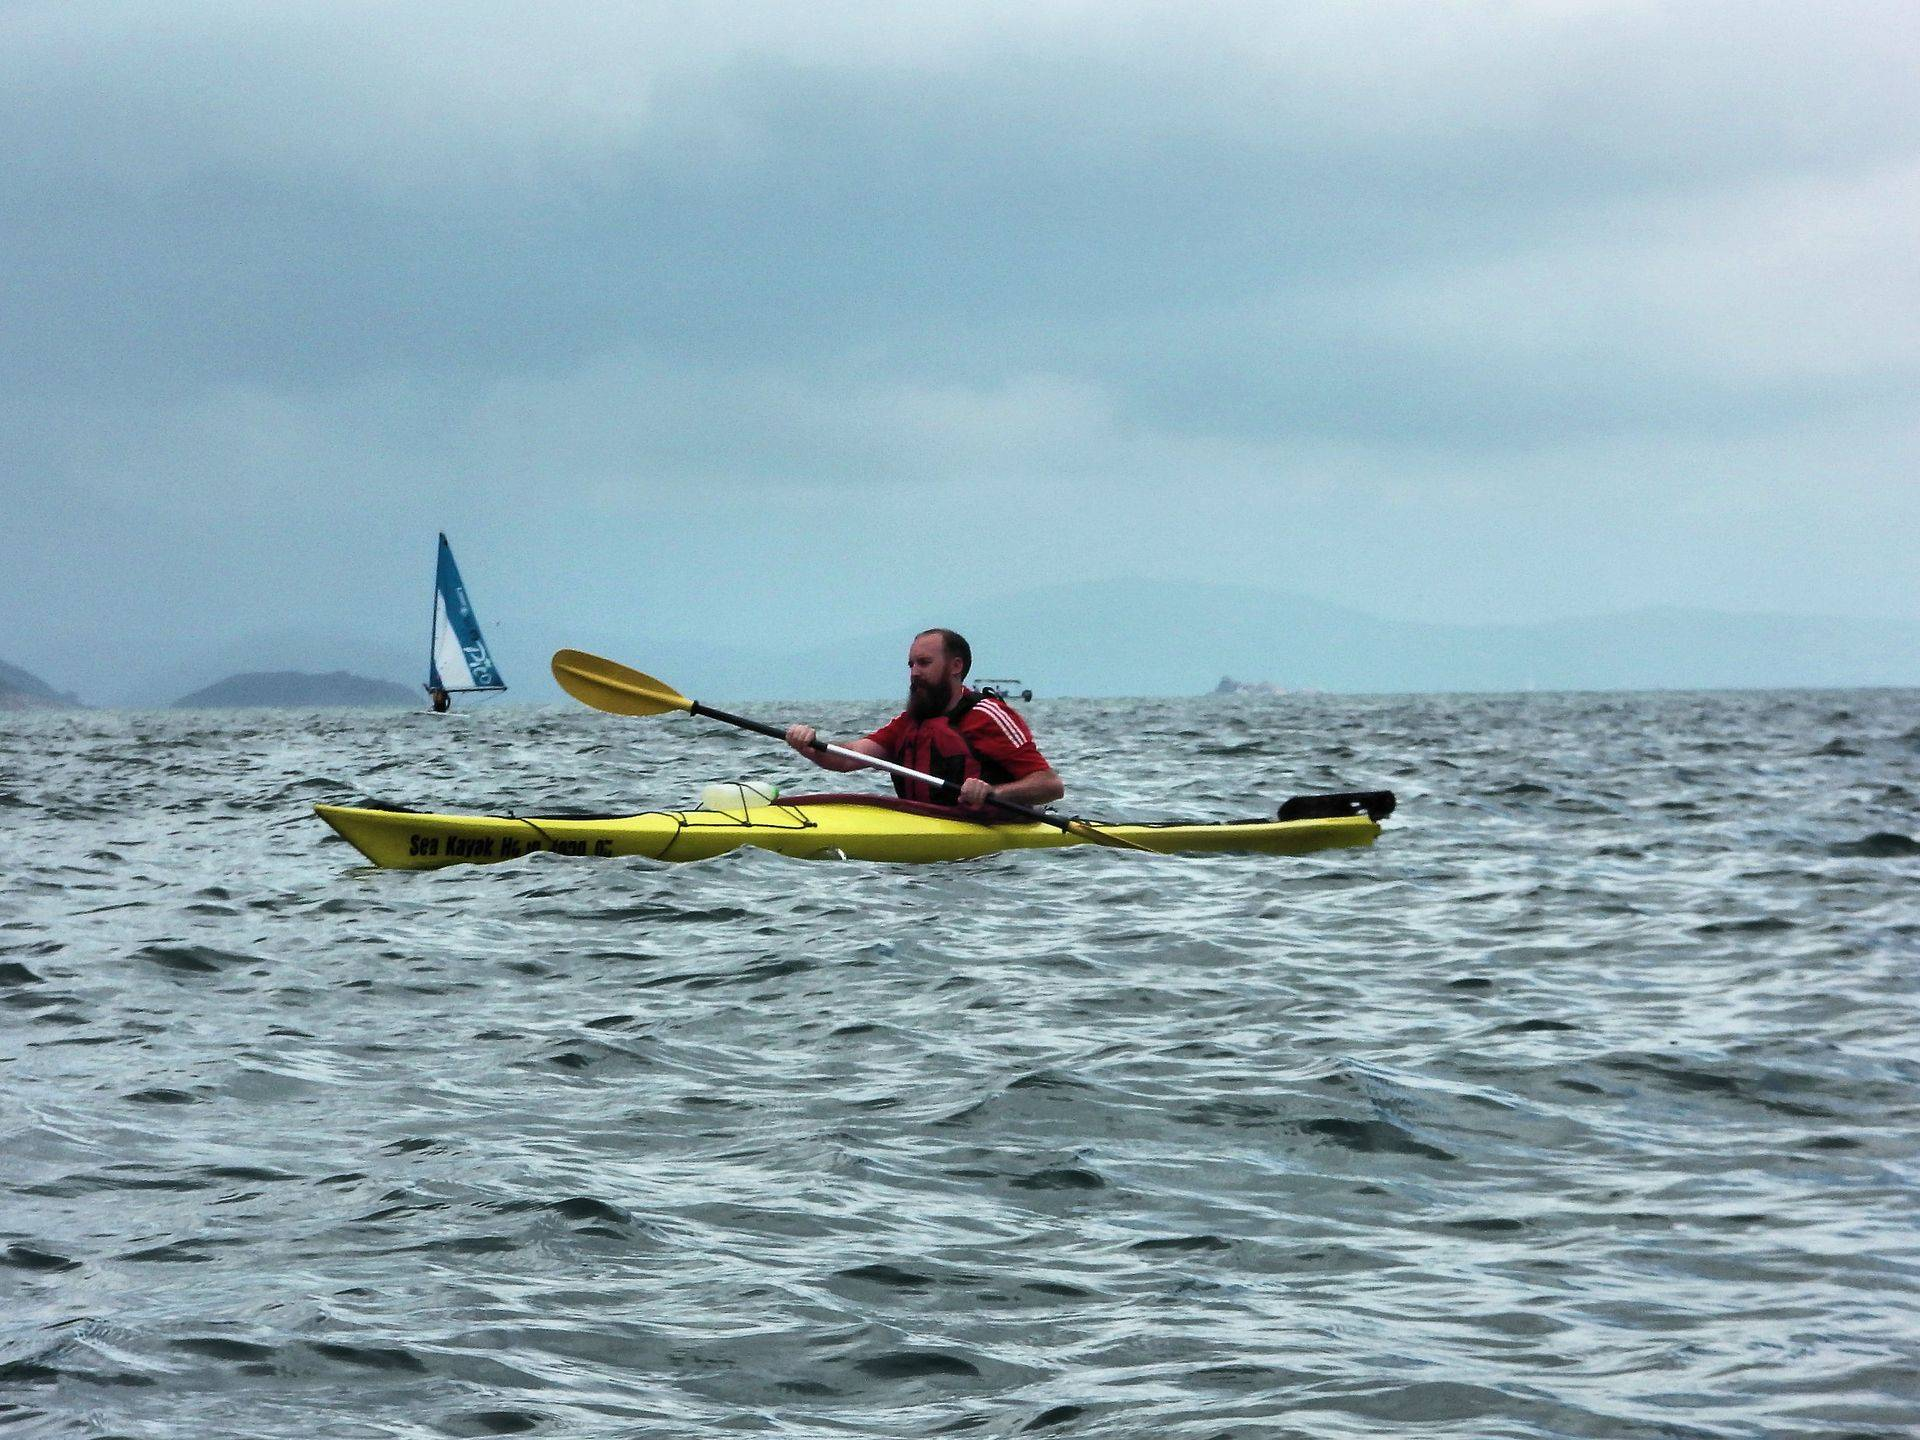 Sea Kayak Hong Kong 2018 Jul 20 Tai Tam_16